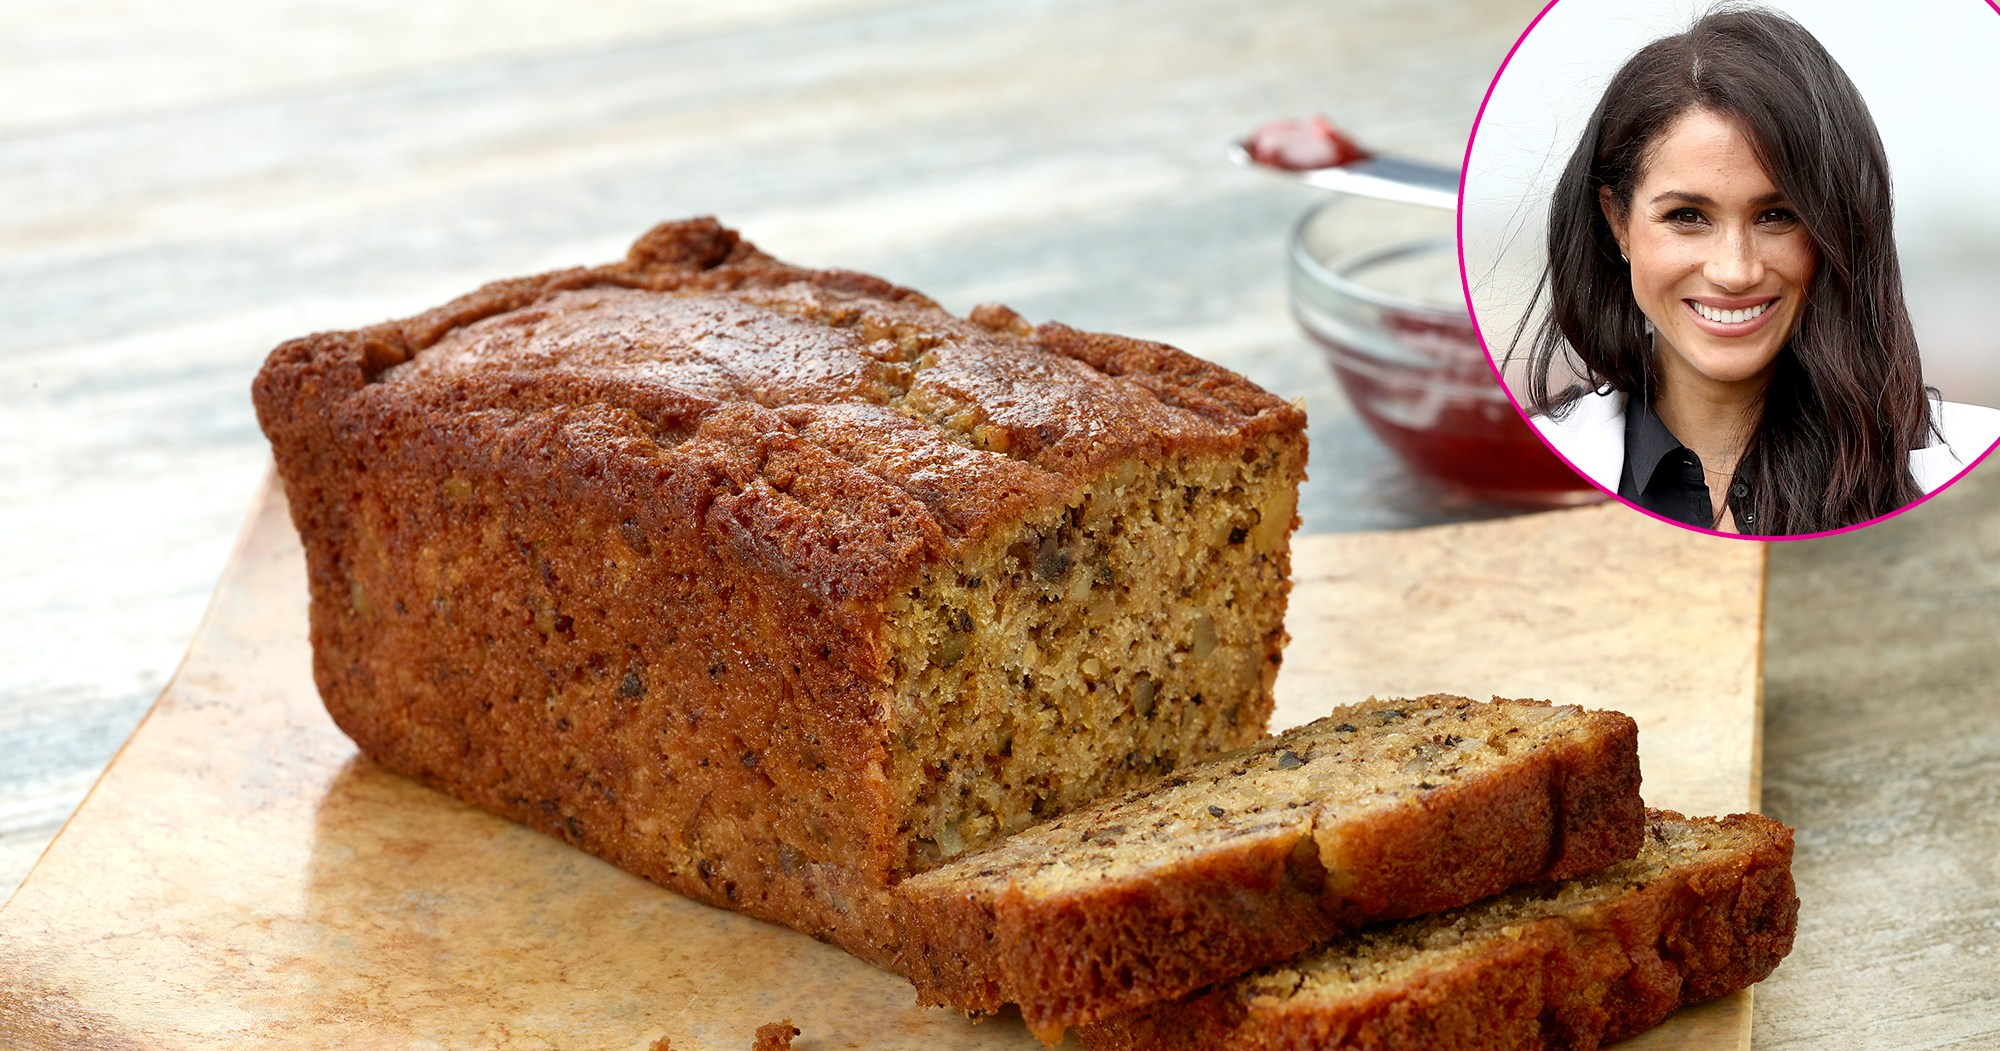 Make Banana Bread Like Meghan Markle With Help From 'Chopped' Star Maneet Chauhan